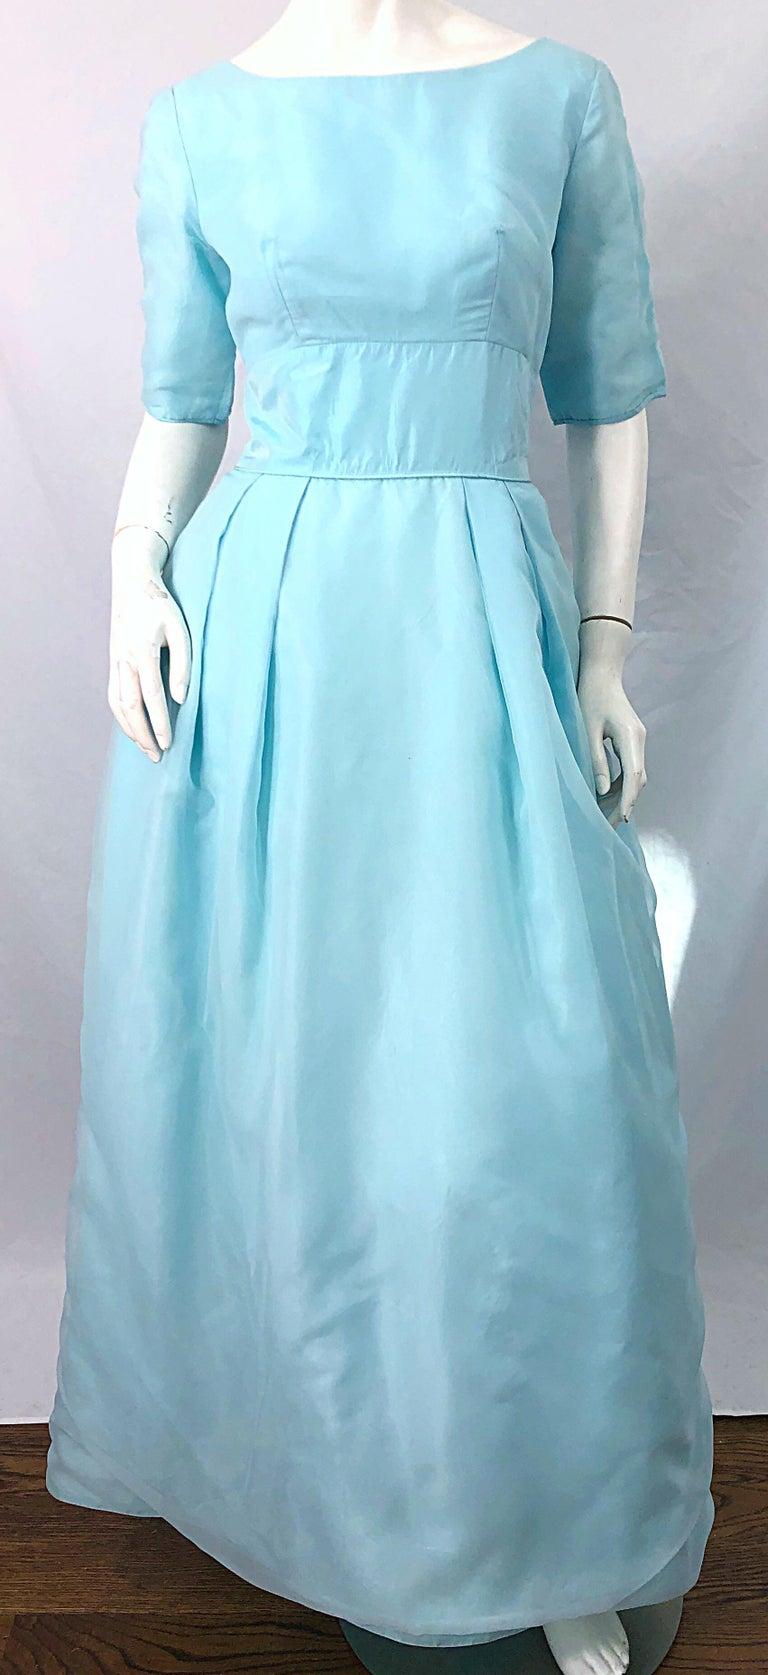 1950s Demi Couture Light Blue Cinderella Silk Chiffon Taffeta 3/4 Sleeves Gown For Sale 2